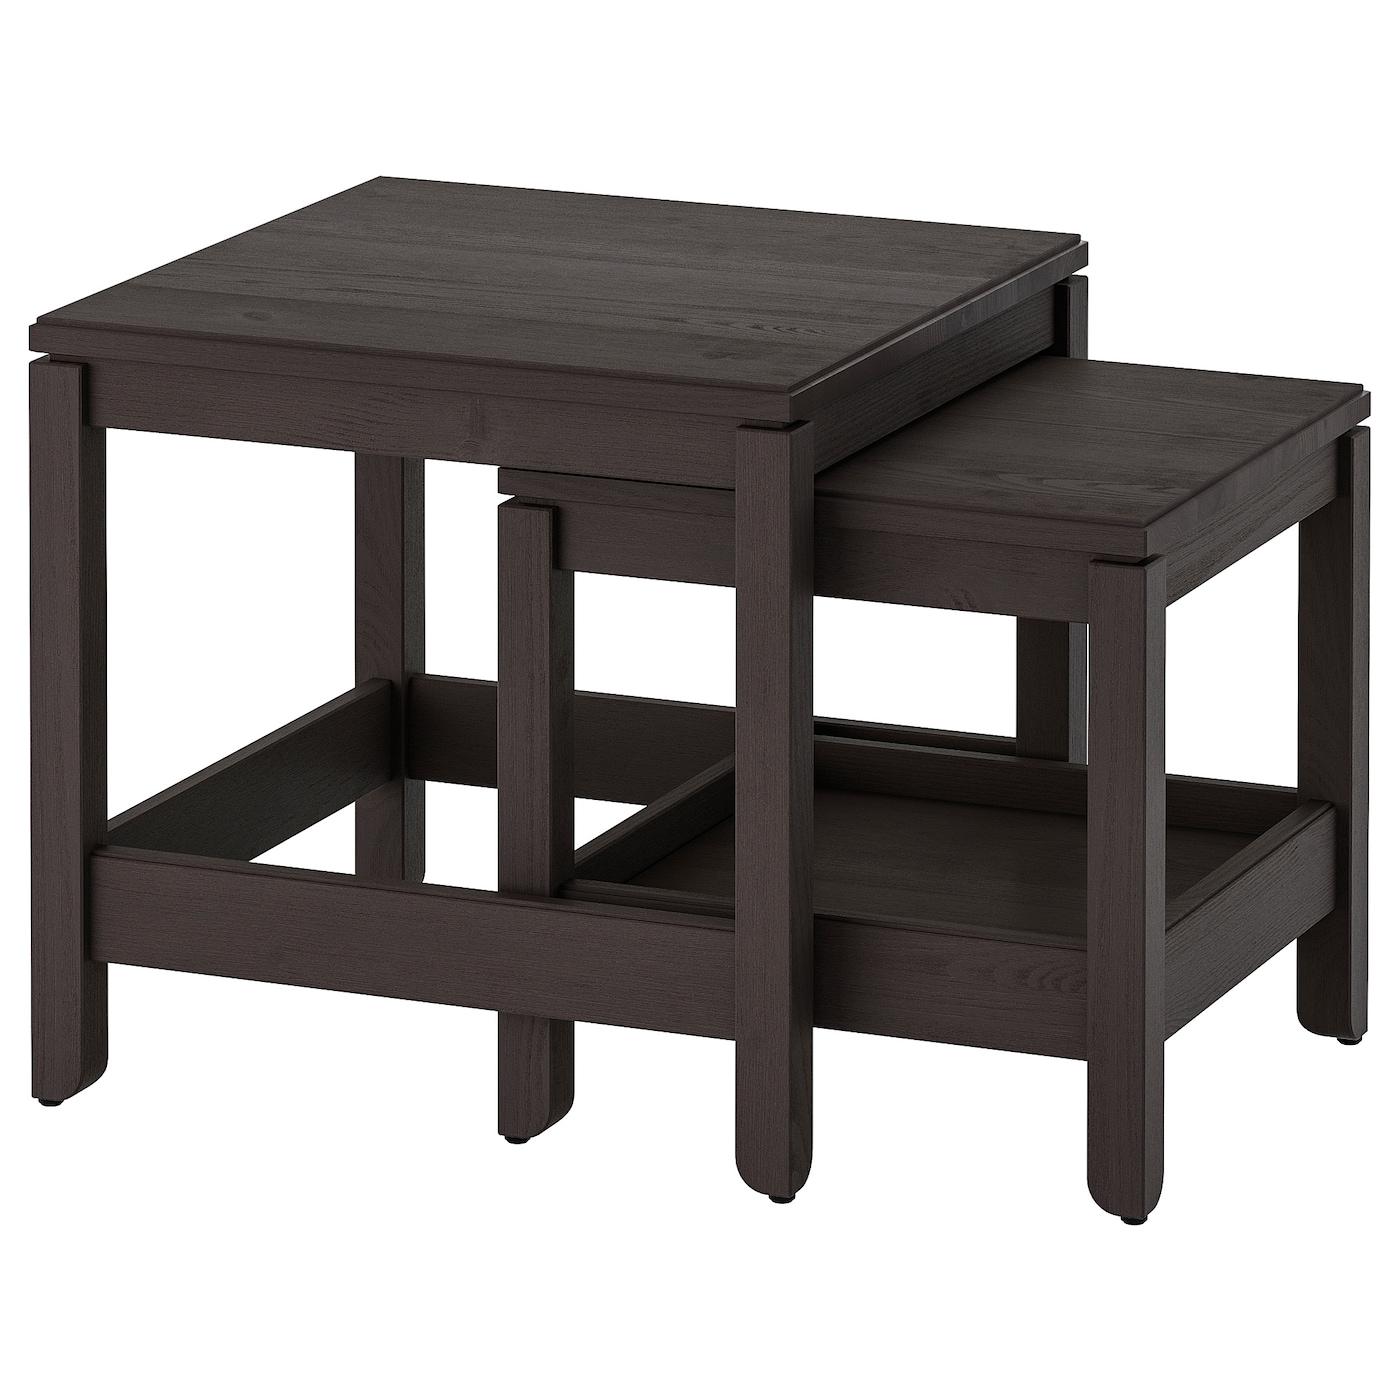 Havsta Nesting Tables Set Of 2 Dark